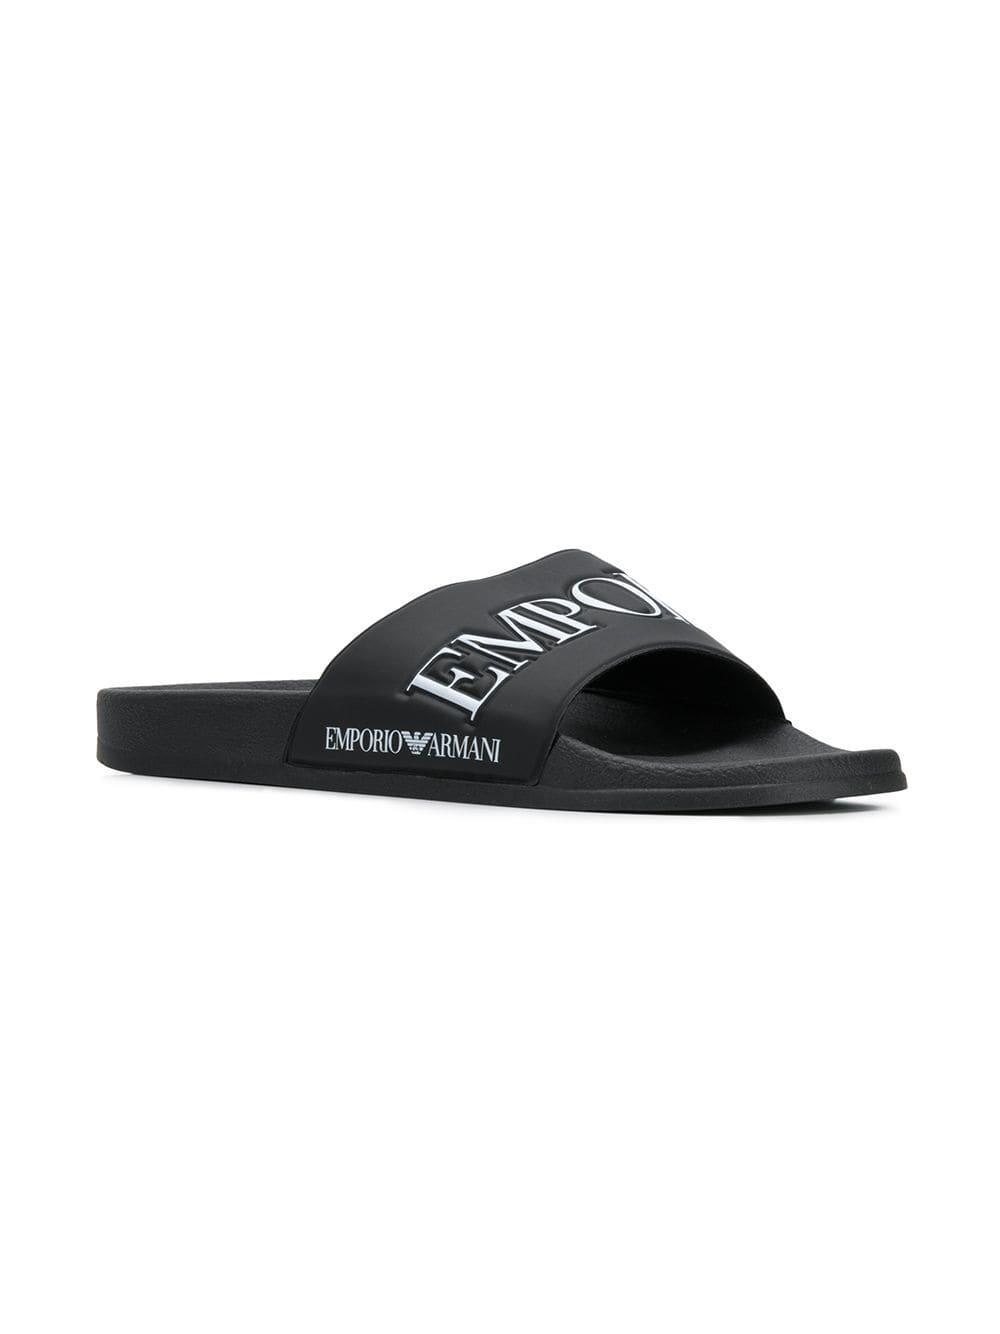 c64982c82 Lyst - Emporio Armani Logo Sliders in Black for Men - Save 23%